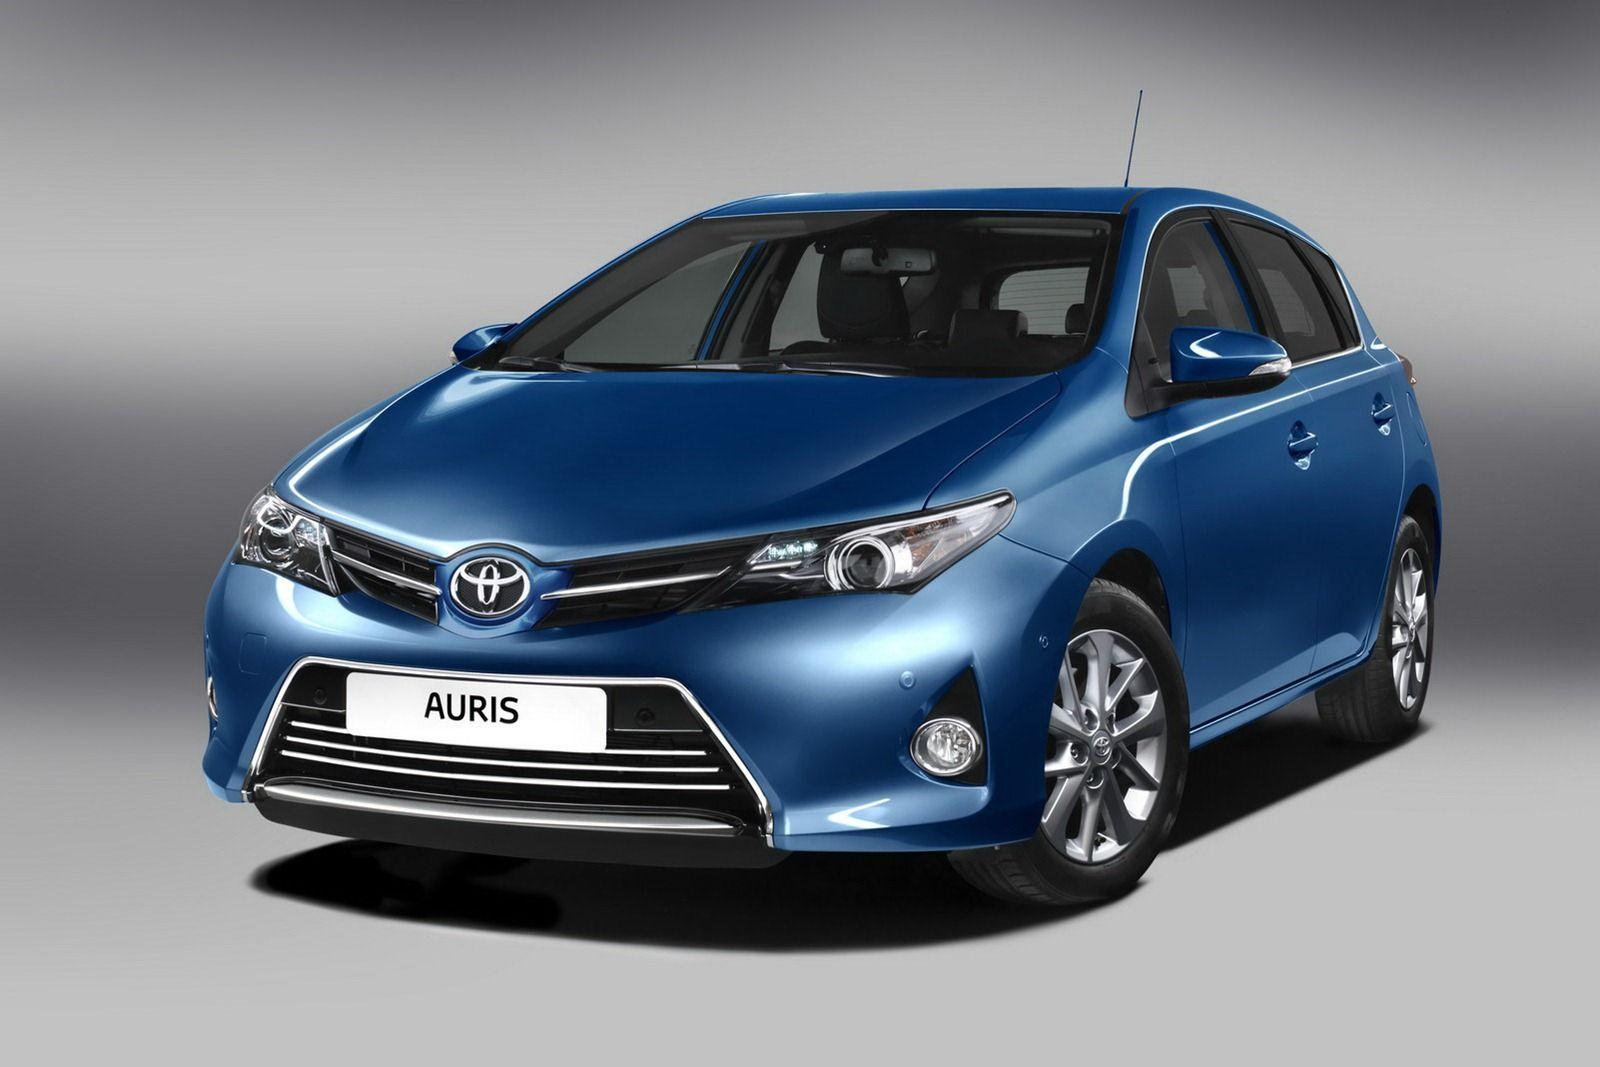 2014 Toyota Auris 1.4 D4D Specs and Price Toyota auris